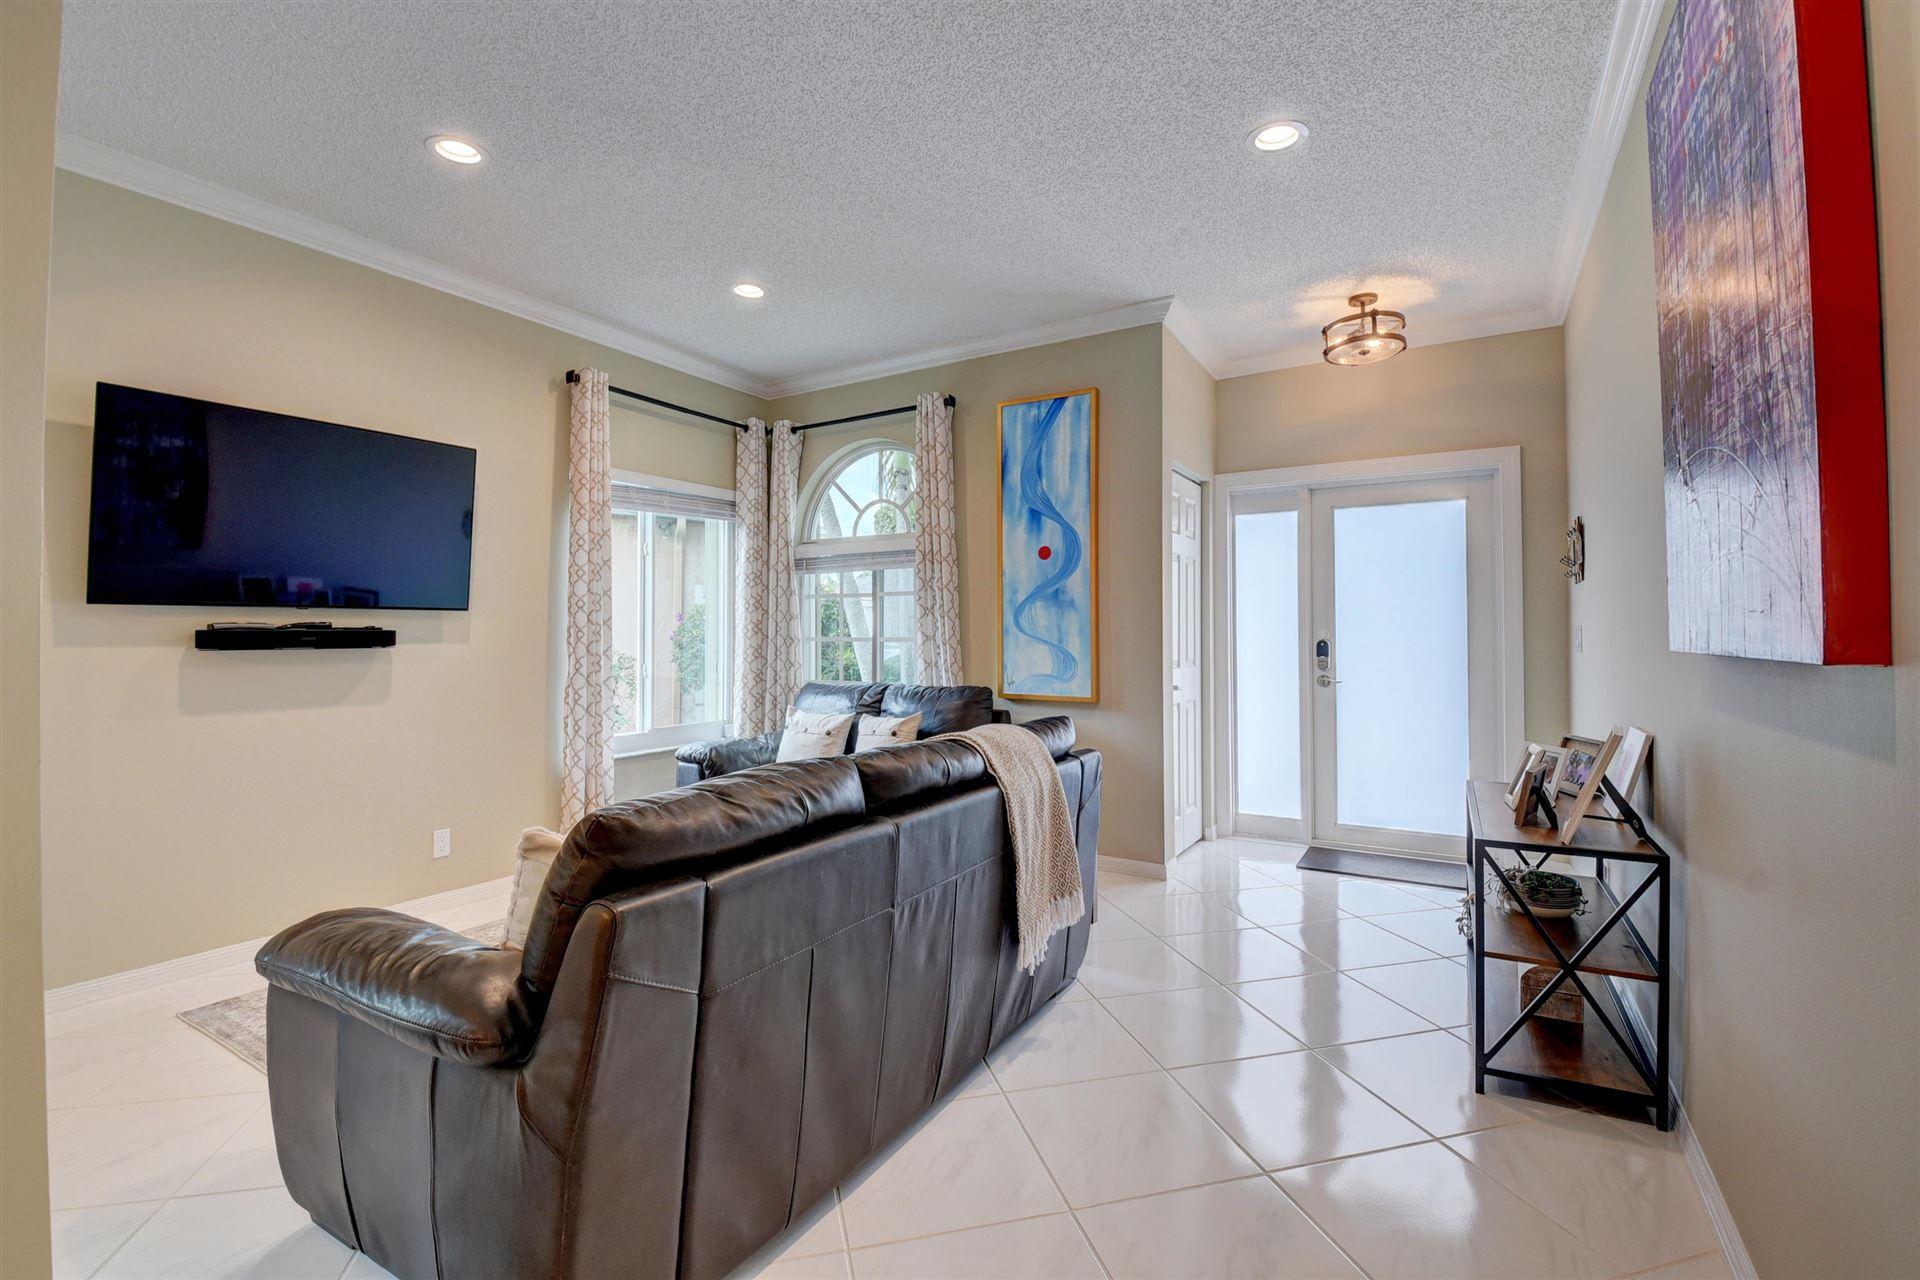 Photo of 1402 SW 45th Way, Deerfield Beach, FL 33442 (MLS # RX-10653820)